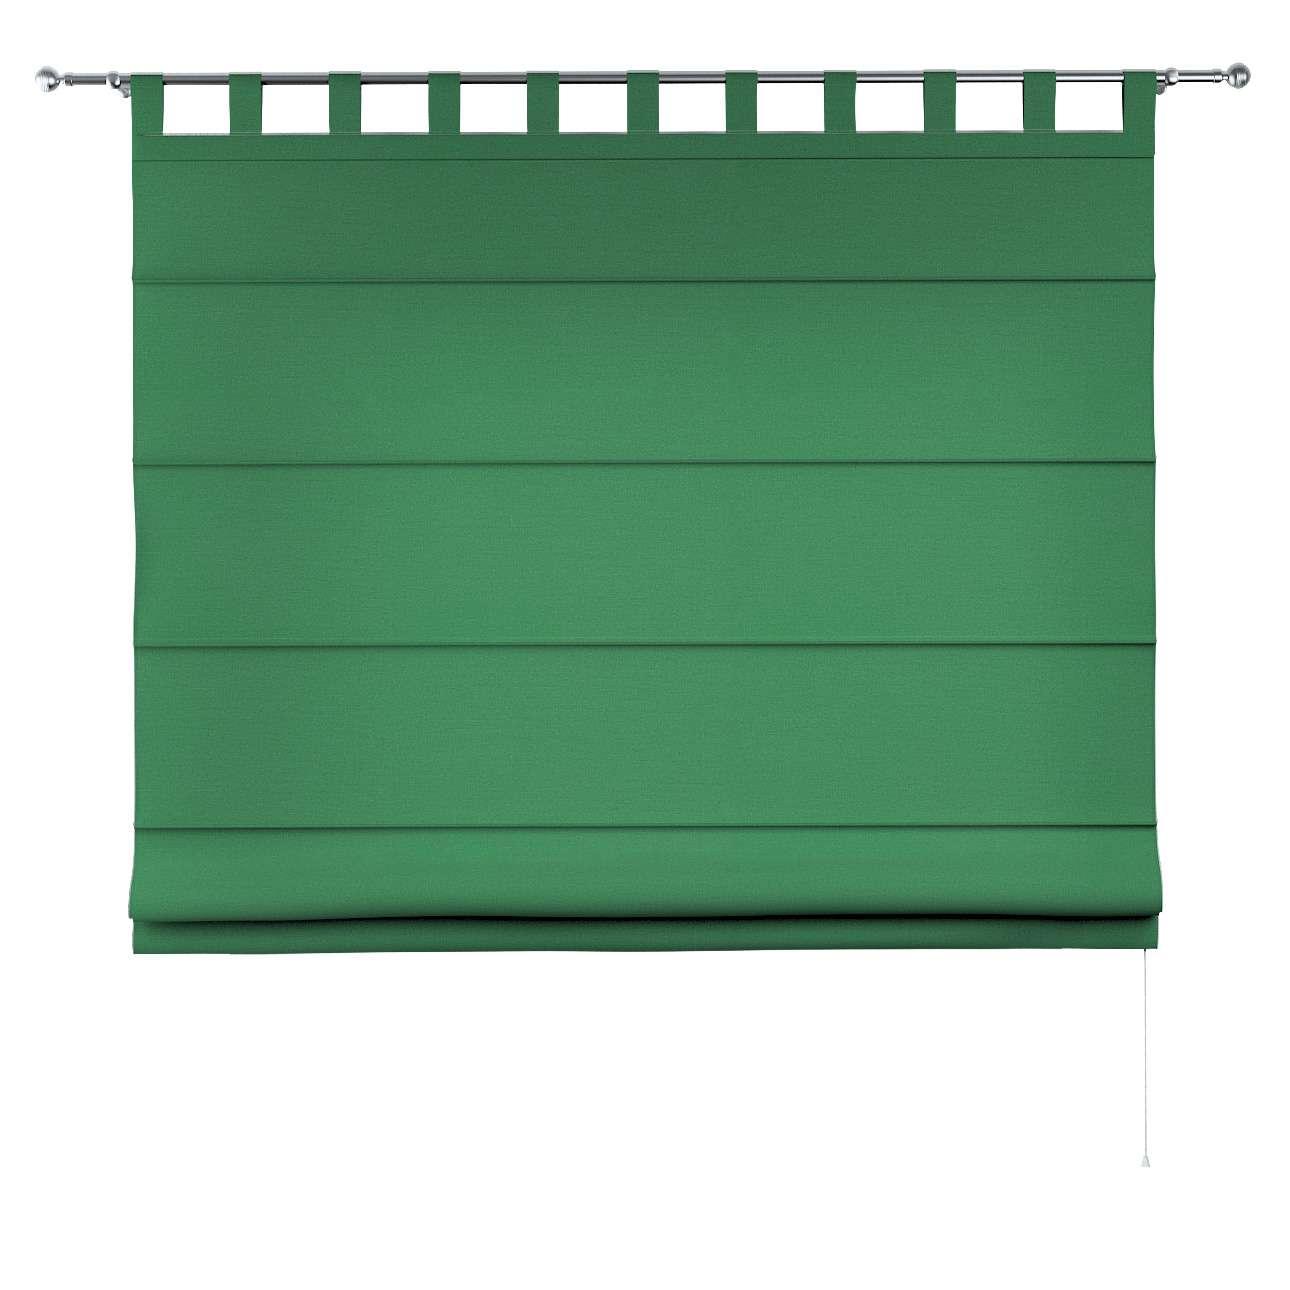 Foldegardin Verona<br/>Med stropper til gardinstang 80 × 170 cm fra kollektionen Loneta, Stof: 133-18